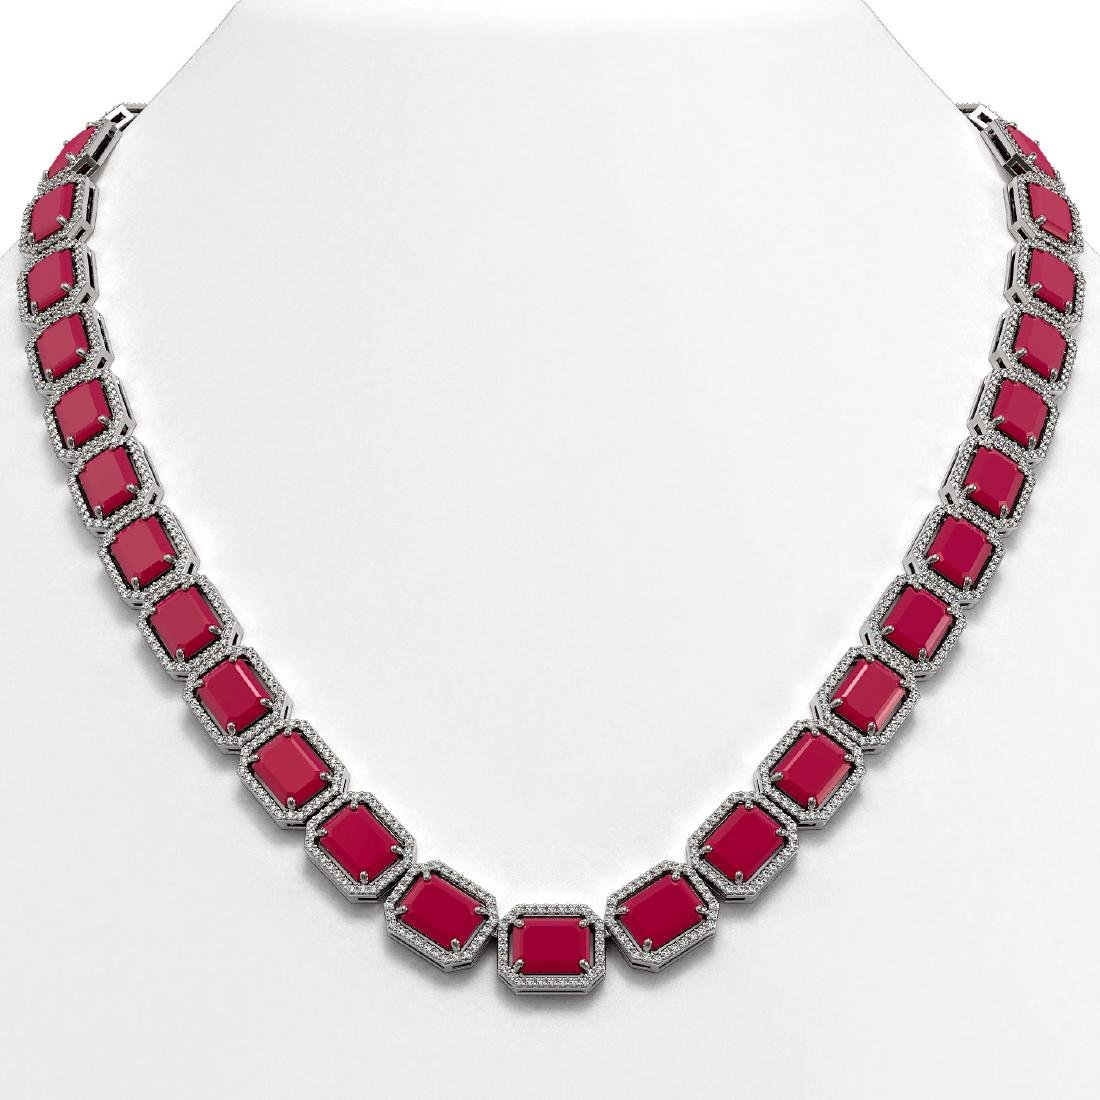 84.94 CTW Ruby & Diamond Halo Necklace 10K White Gold